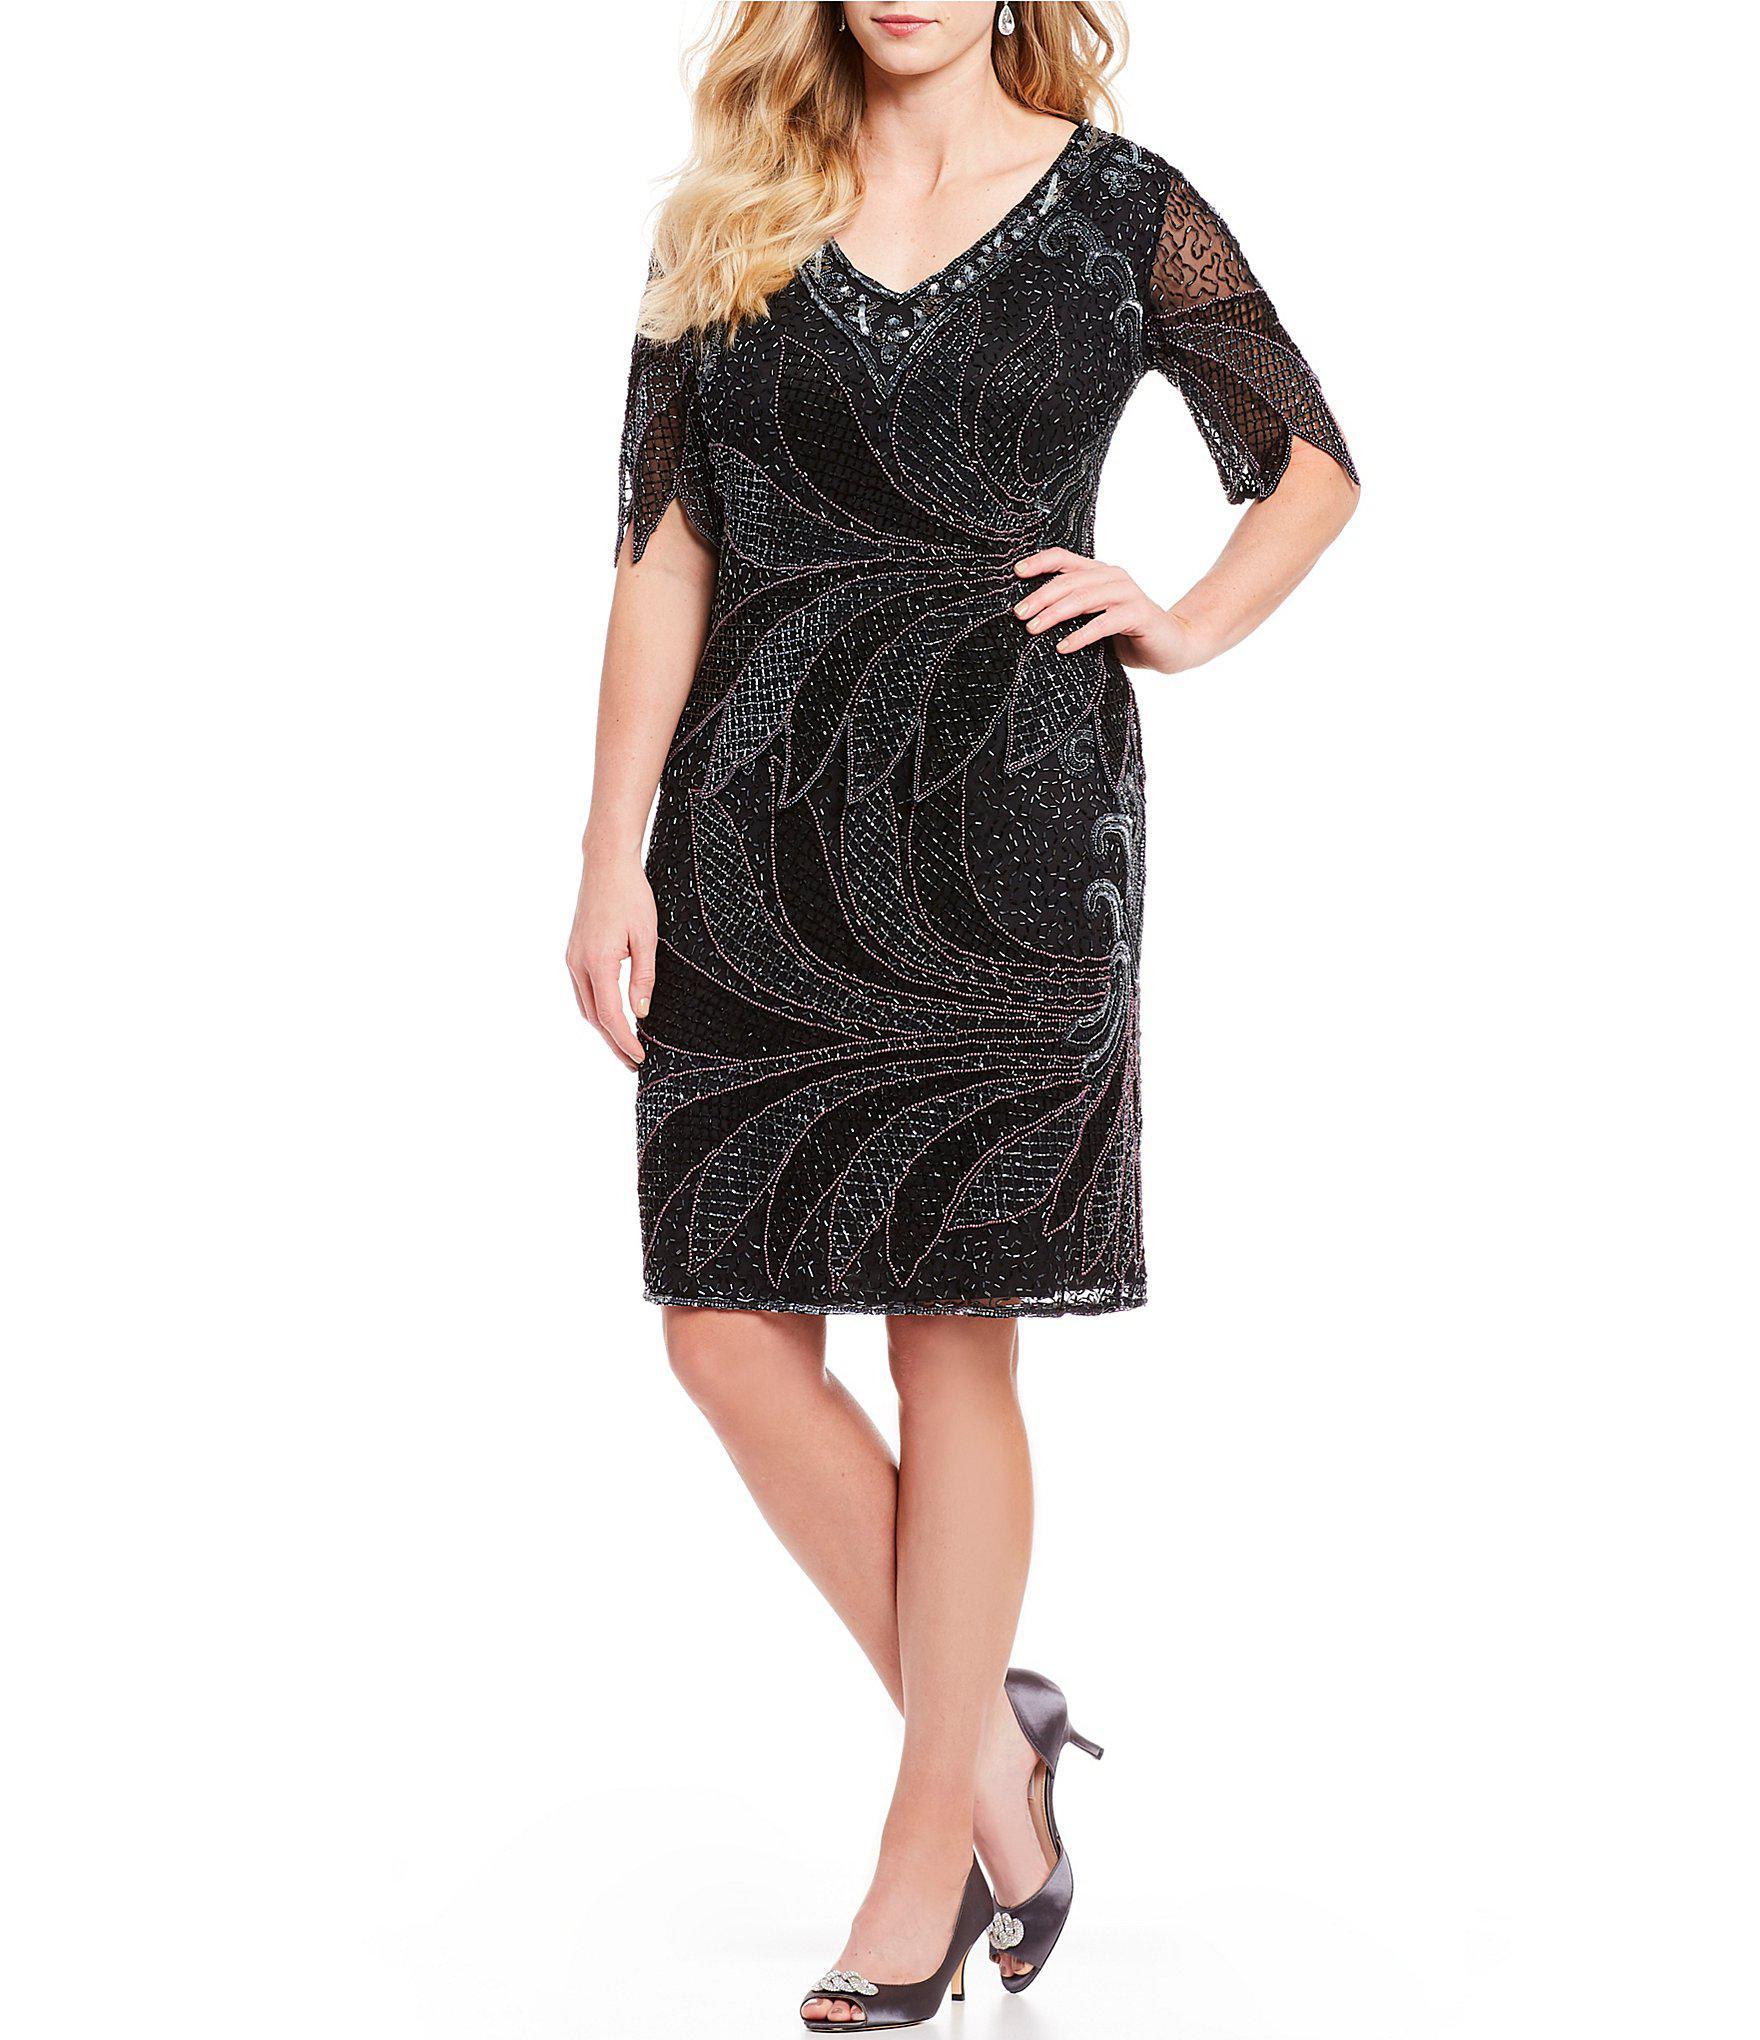 ea49dbf896e Pisarro Nights - Black Plus Size Short Sleeve Mock Beaded 2-piece Dress -  Lyst. View fullscreen